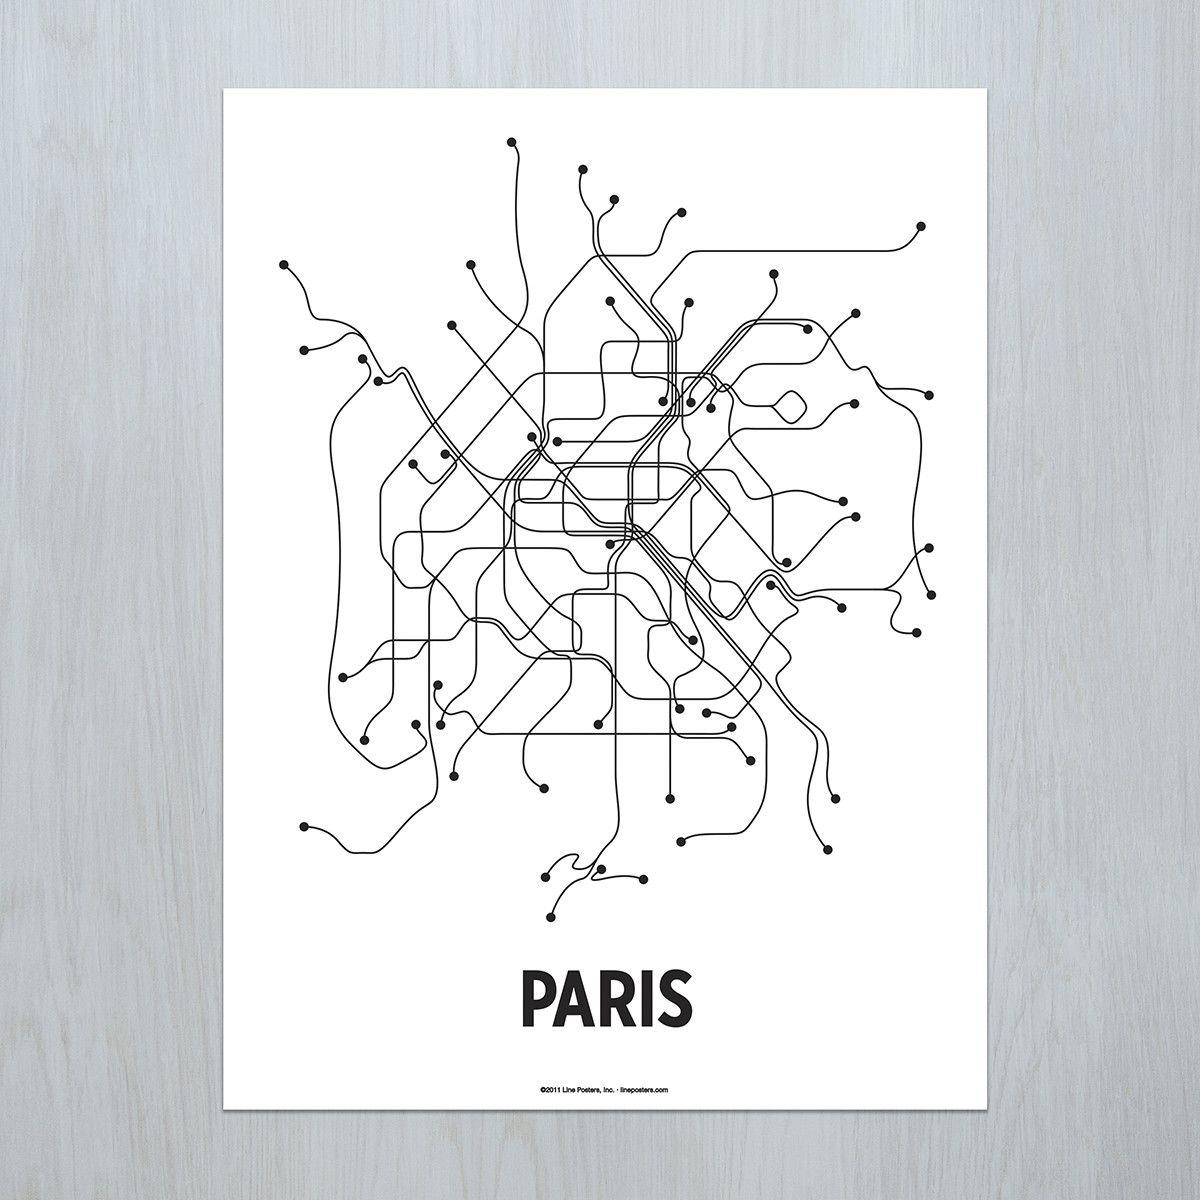 A modern graphic interpretation of the Paris transit system ...